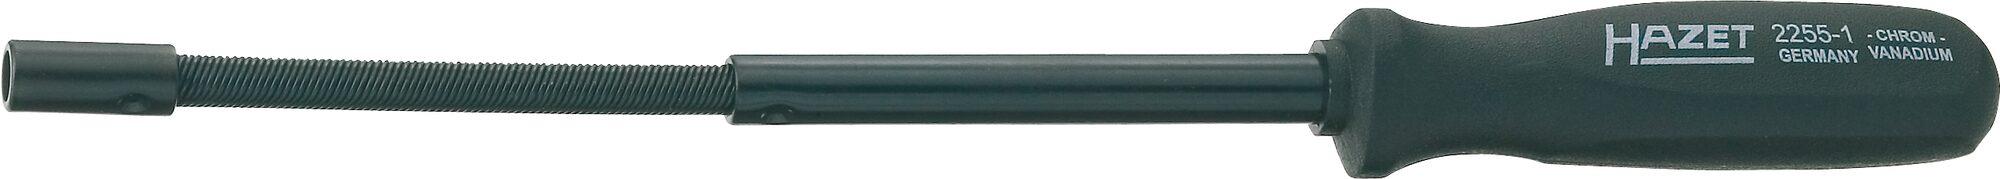 HAZET Bit Halter 2255-1 ∙ Sechskant hohl 6,3 (1/4 Zoll) ∙ 310 mm